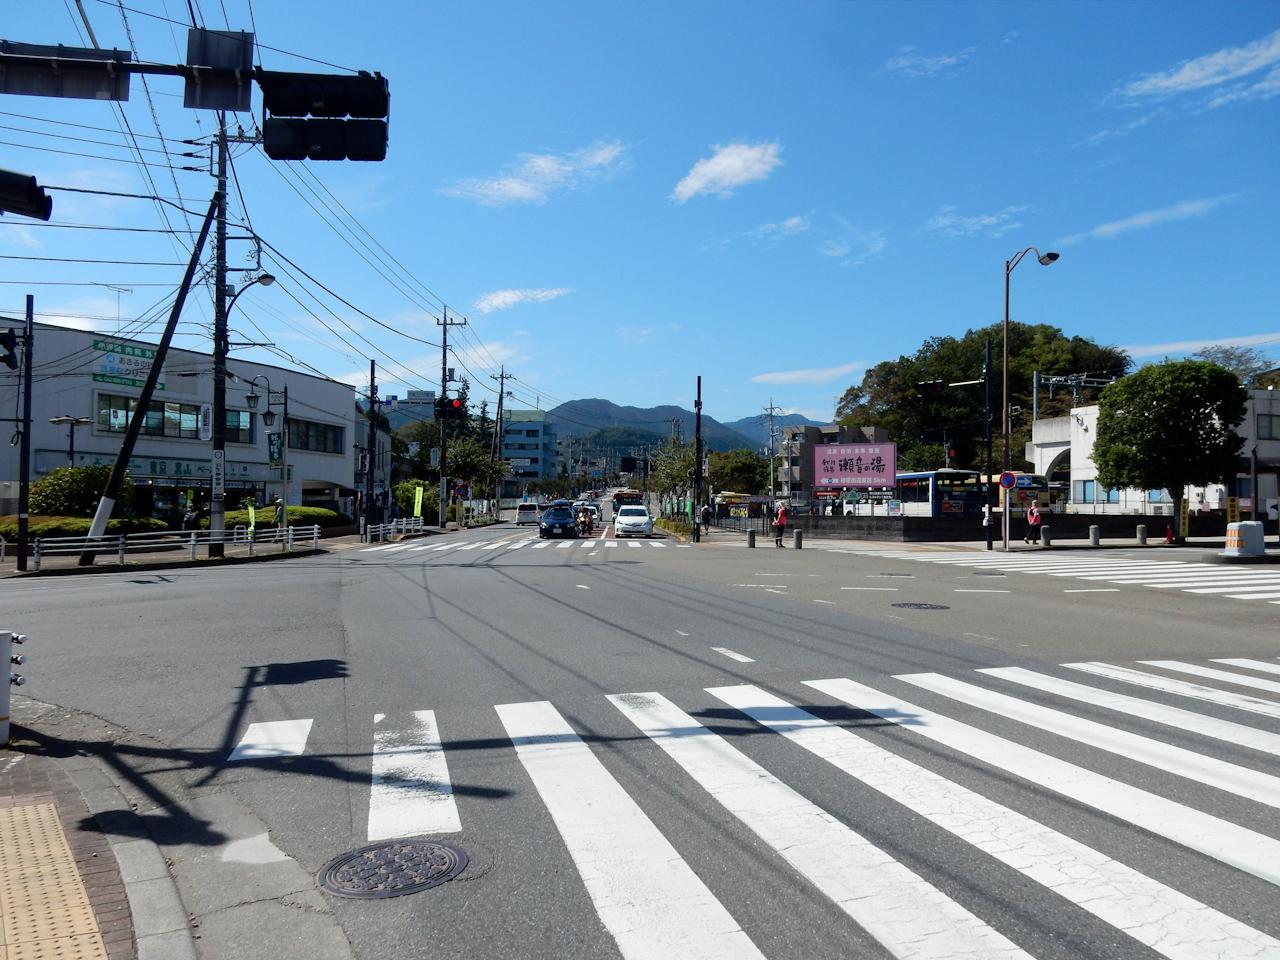 AJたまがわ 2018 BRM1007 奥多摩200k 参加 武蔵五日市駅